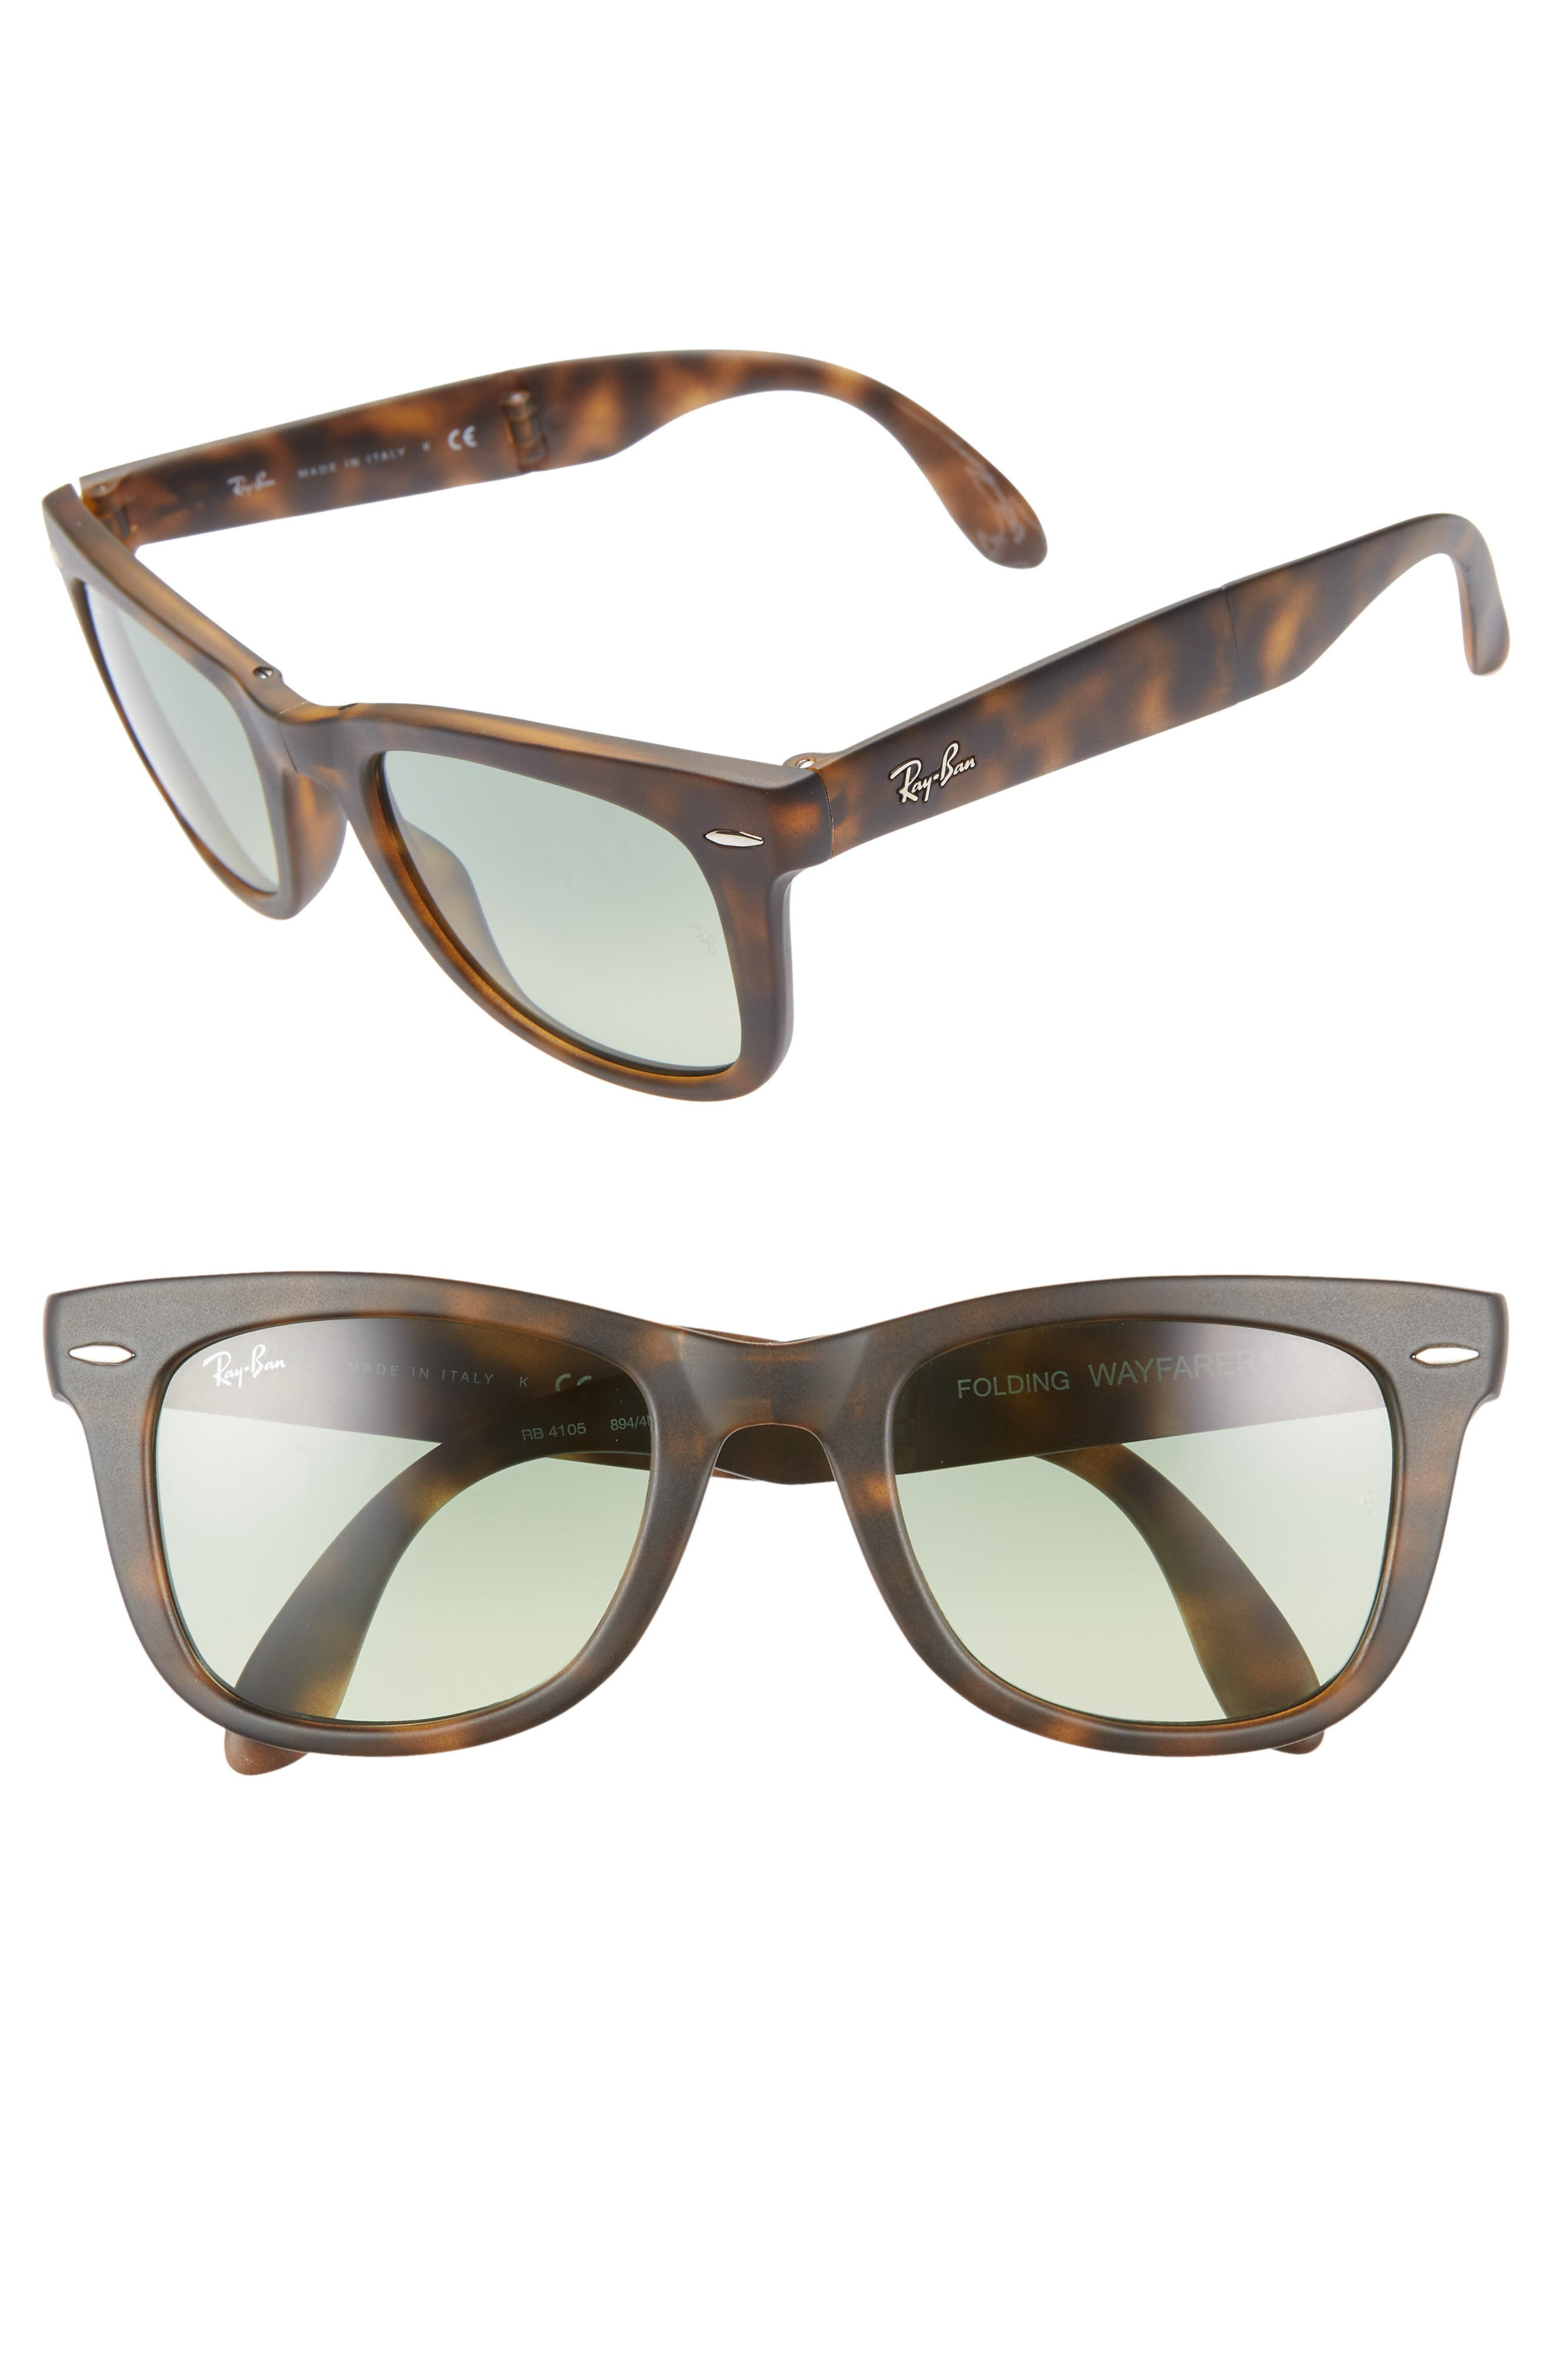 Ray-Ban 50Mm Wayfarer Folding Sunglasses - Green/ Havana Gradient